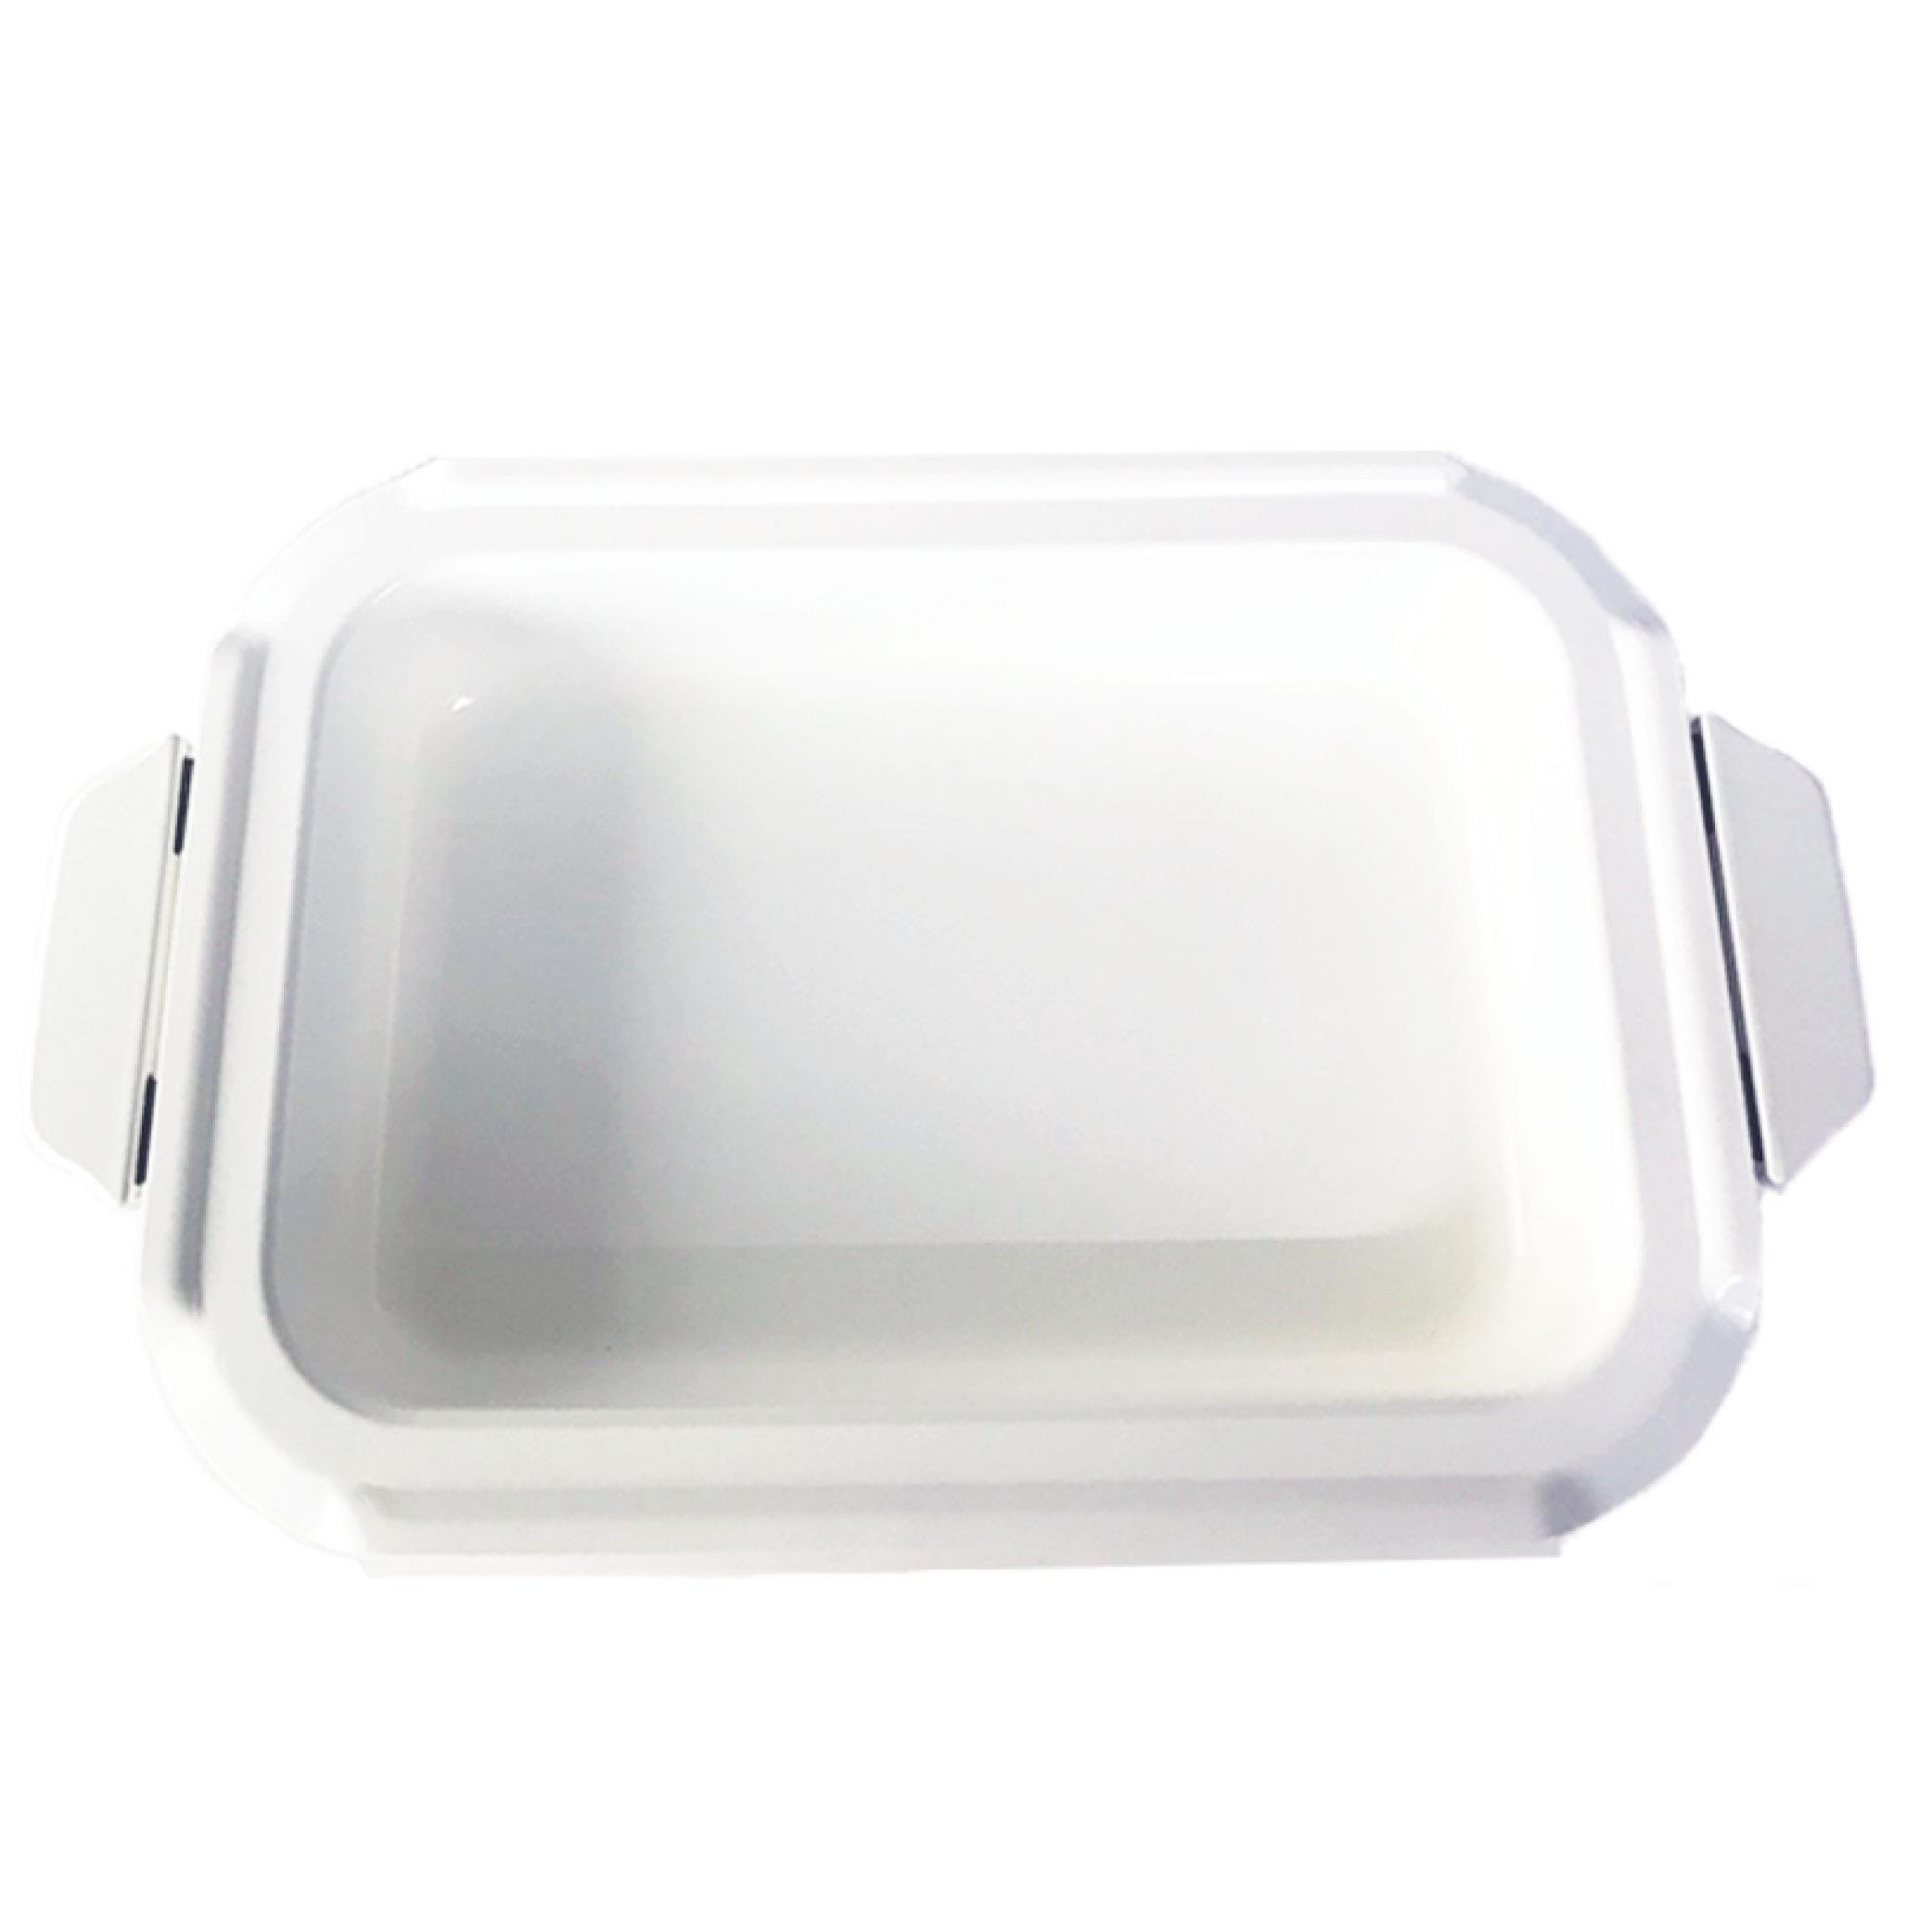 Tiffany蒂芬妮藍鑽石電烤盤 專用陶瓷鍋EH1701A(不含主機)